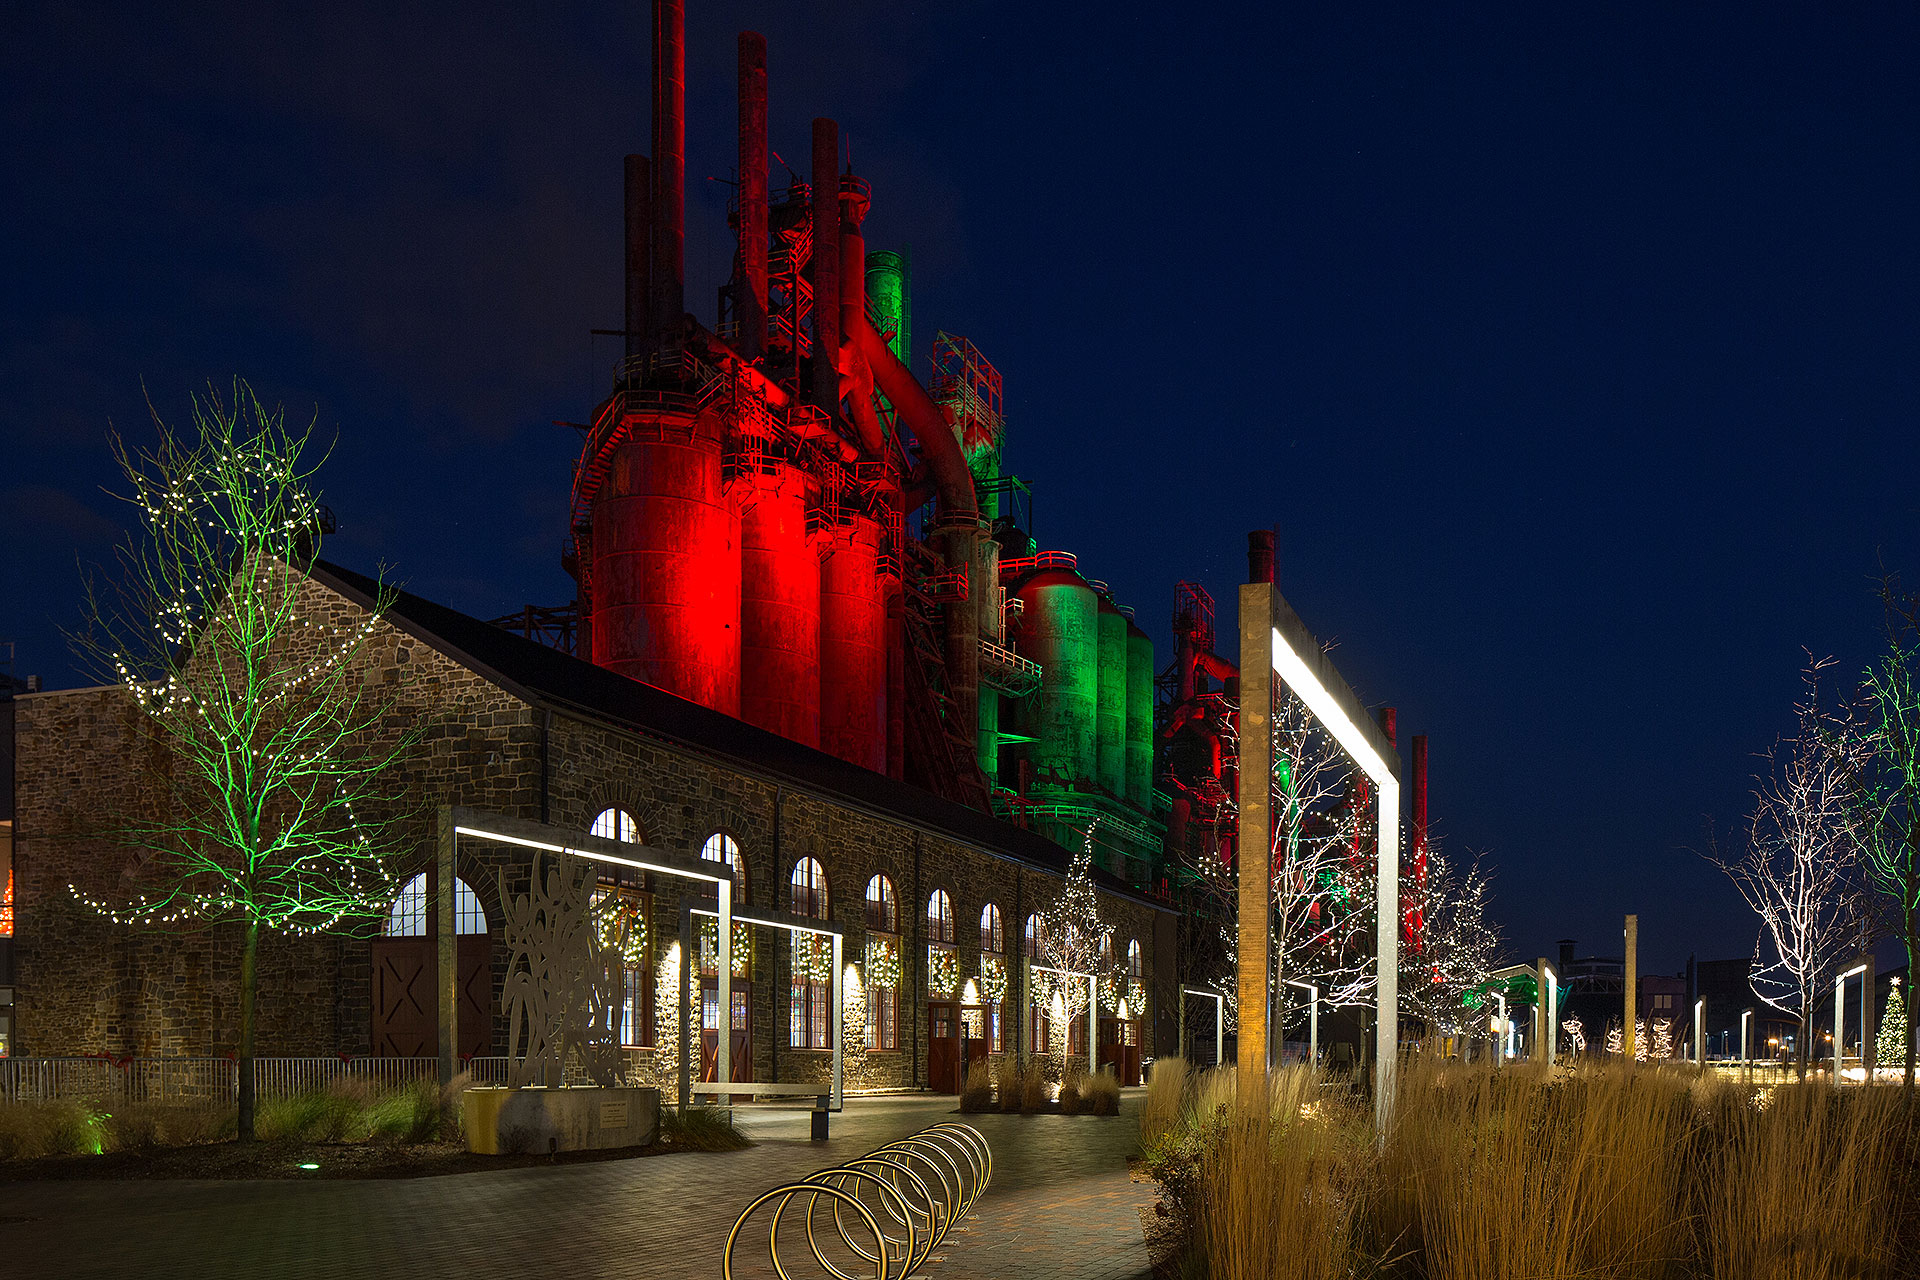 Bethlehem Steel Stacks at Christmastime; Courtesy of Discover Lehigh Valley